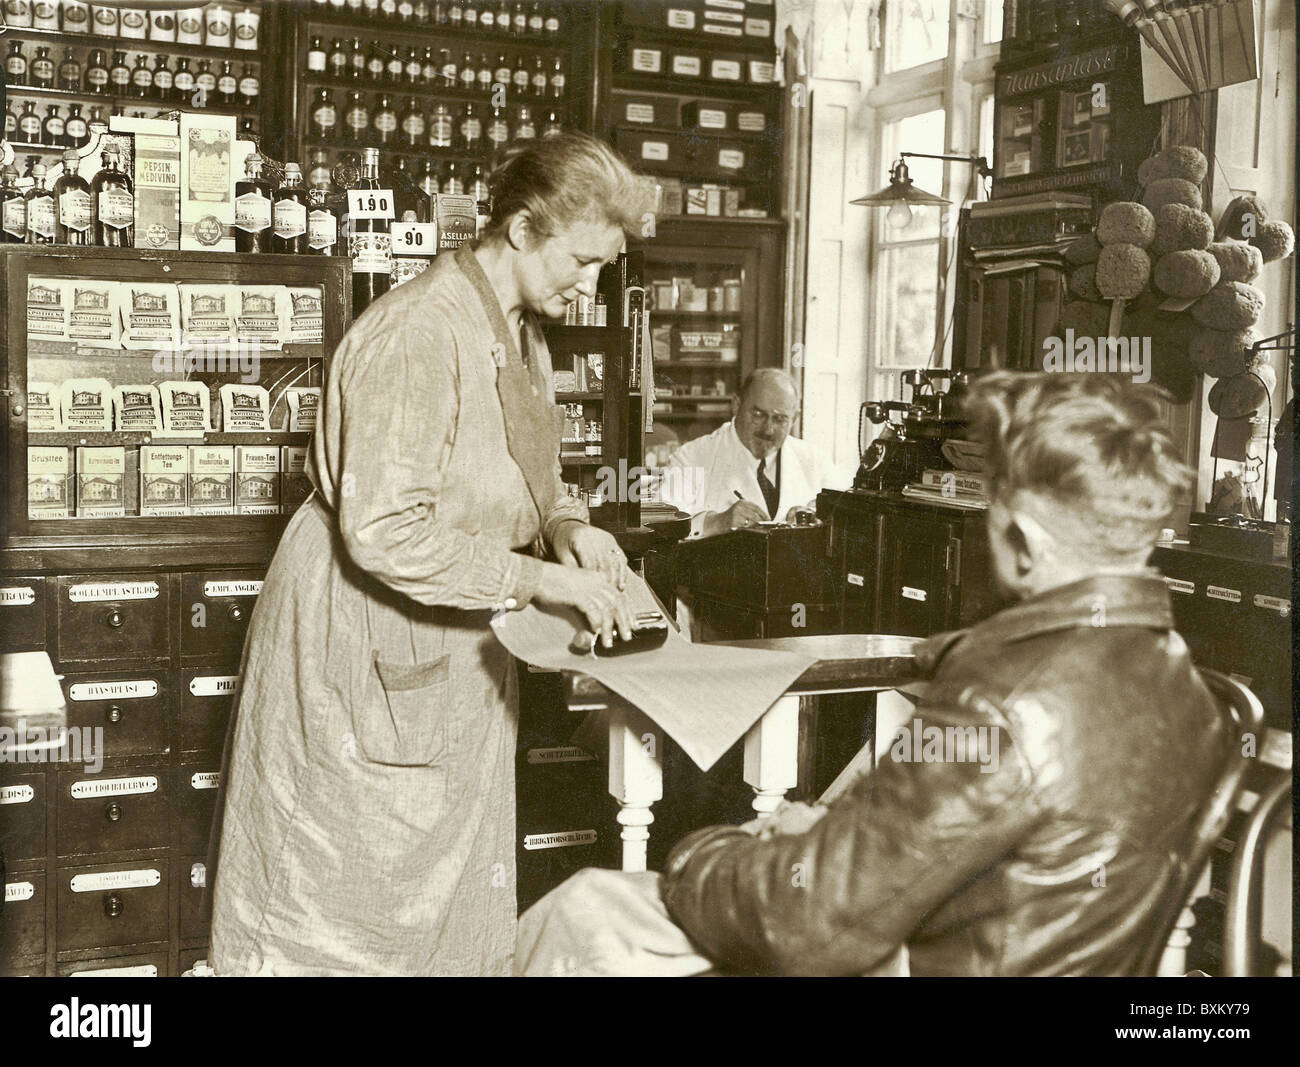 medicine pharmacy s of medicinal drugs hamburg medicine pharmacy s of medicinal drugs hamburg circa 1929